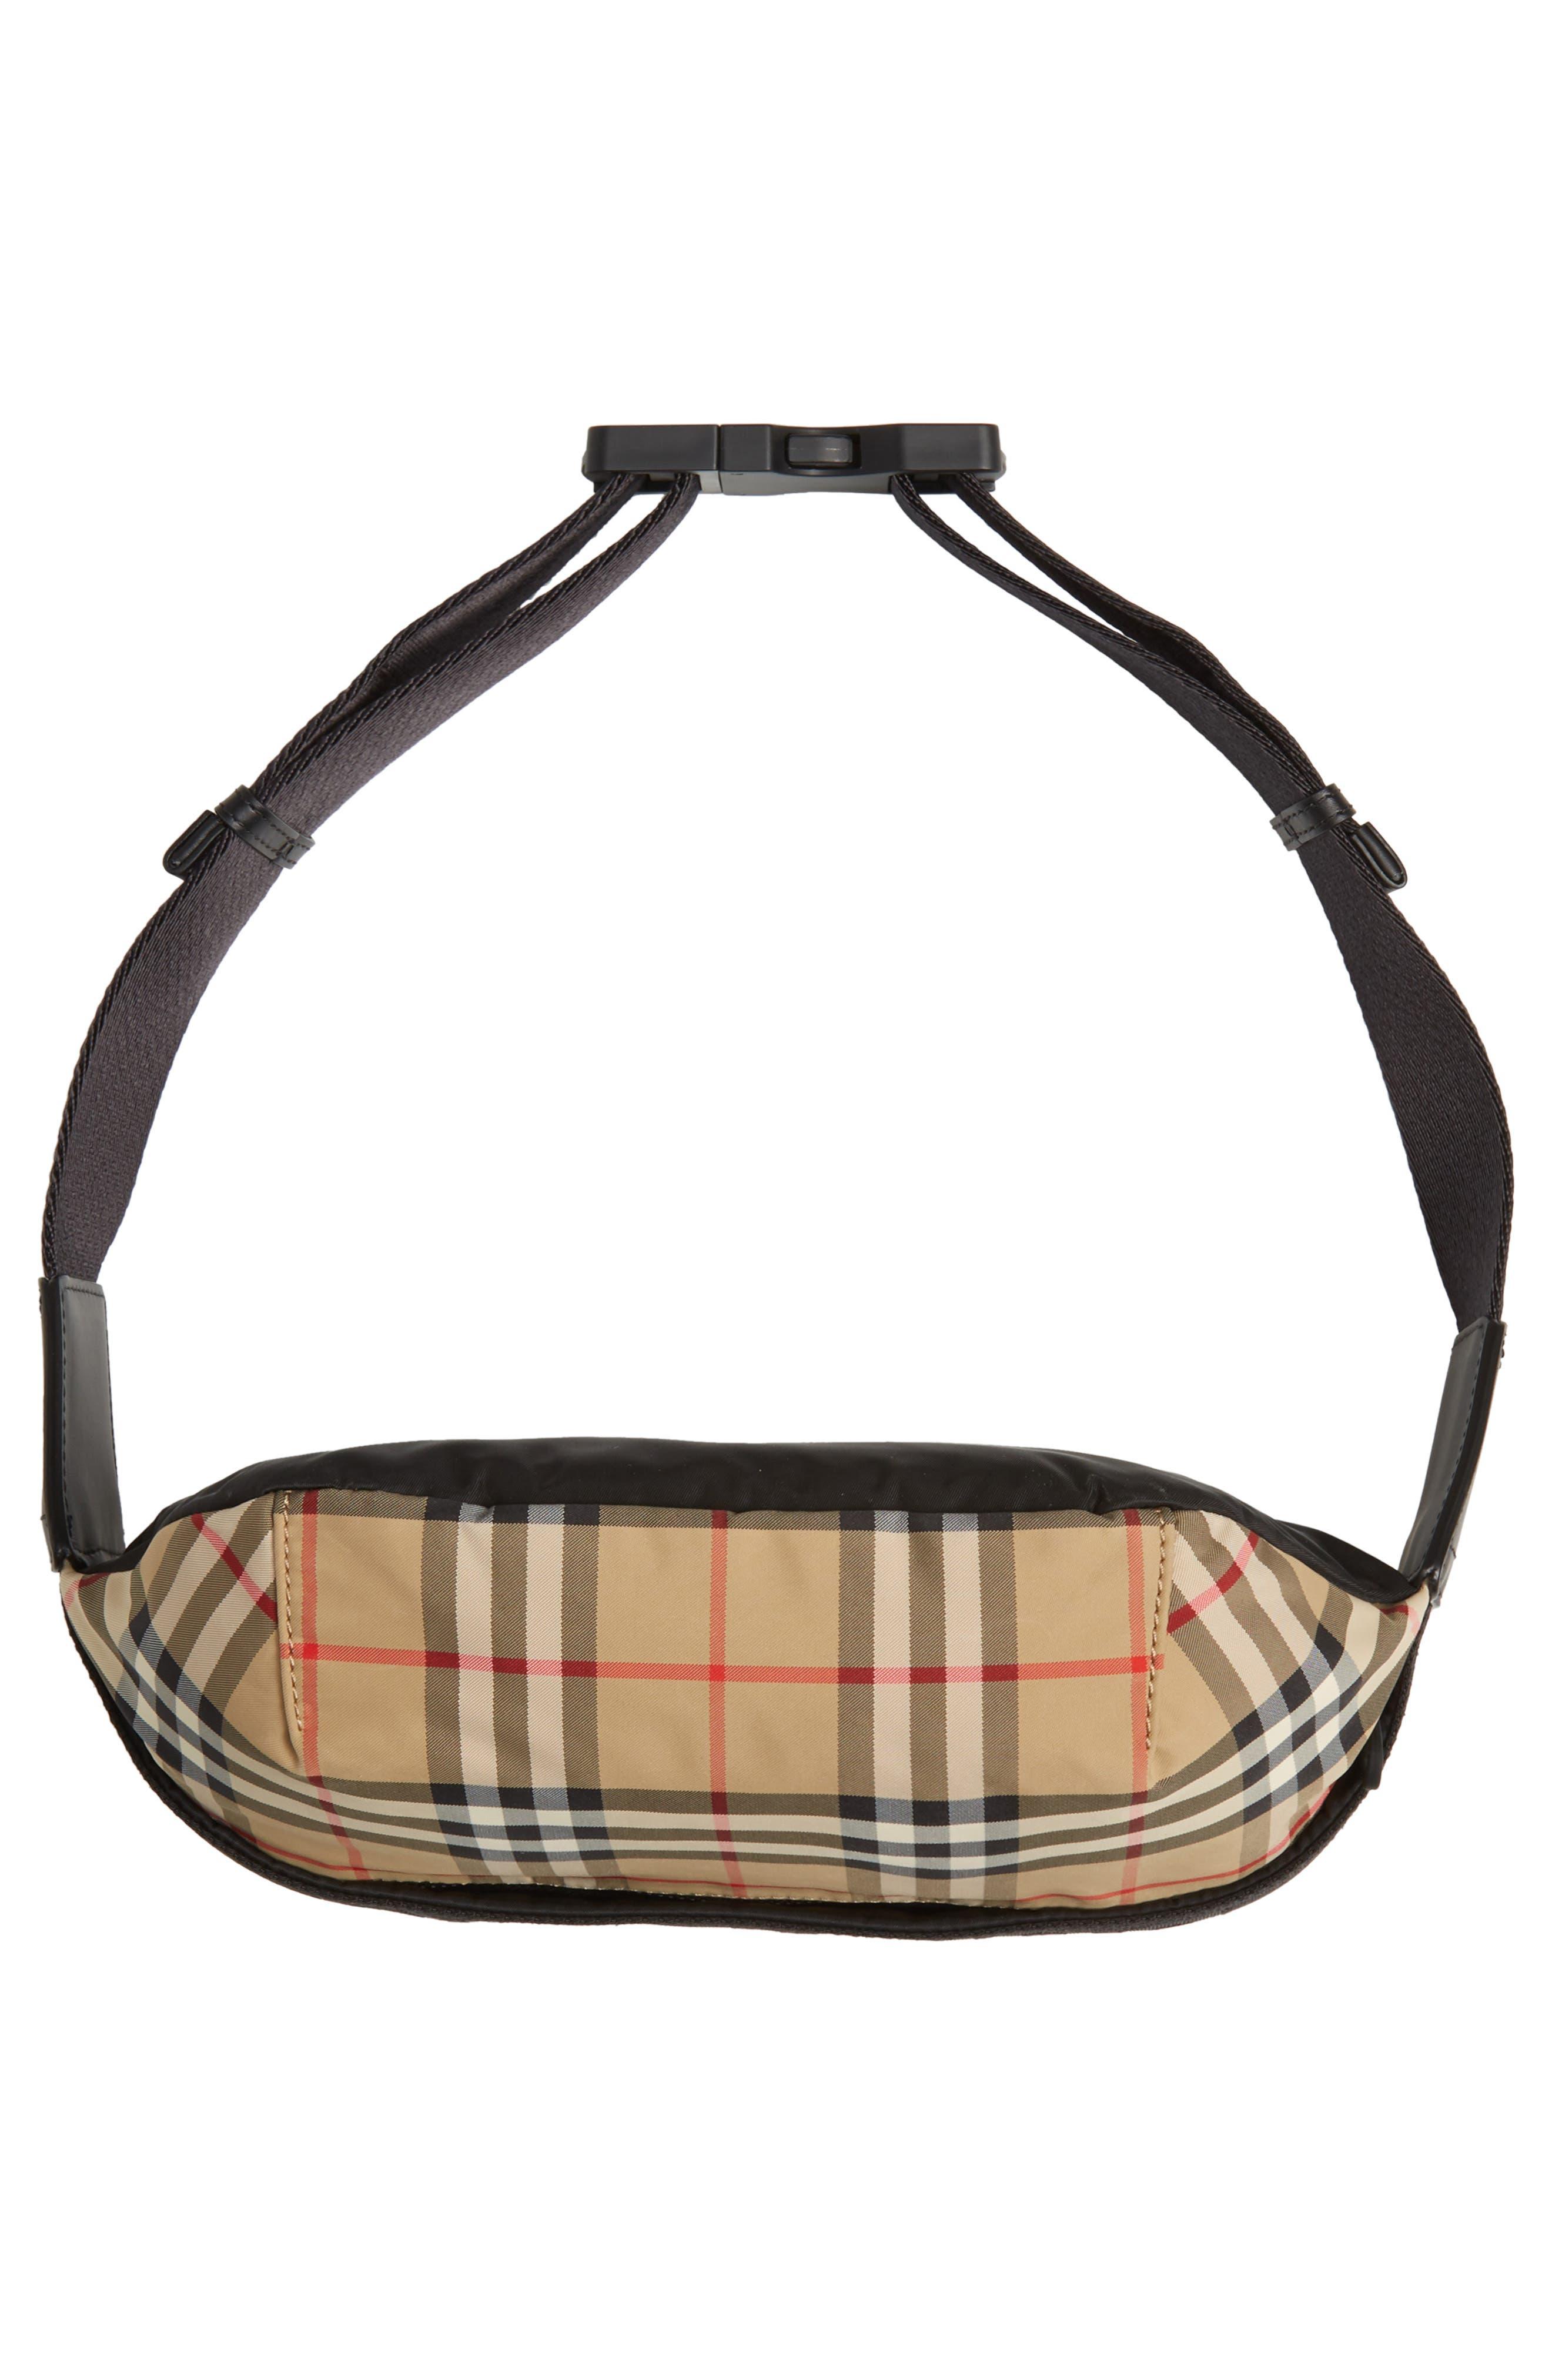 BURBERRY,                             Burberrry Medium Sonny Vintage Check Belt Bag,                             Alternate thumbnail 7, color,                             ARCHIVE BEIGE